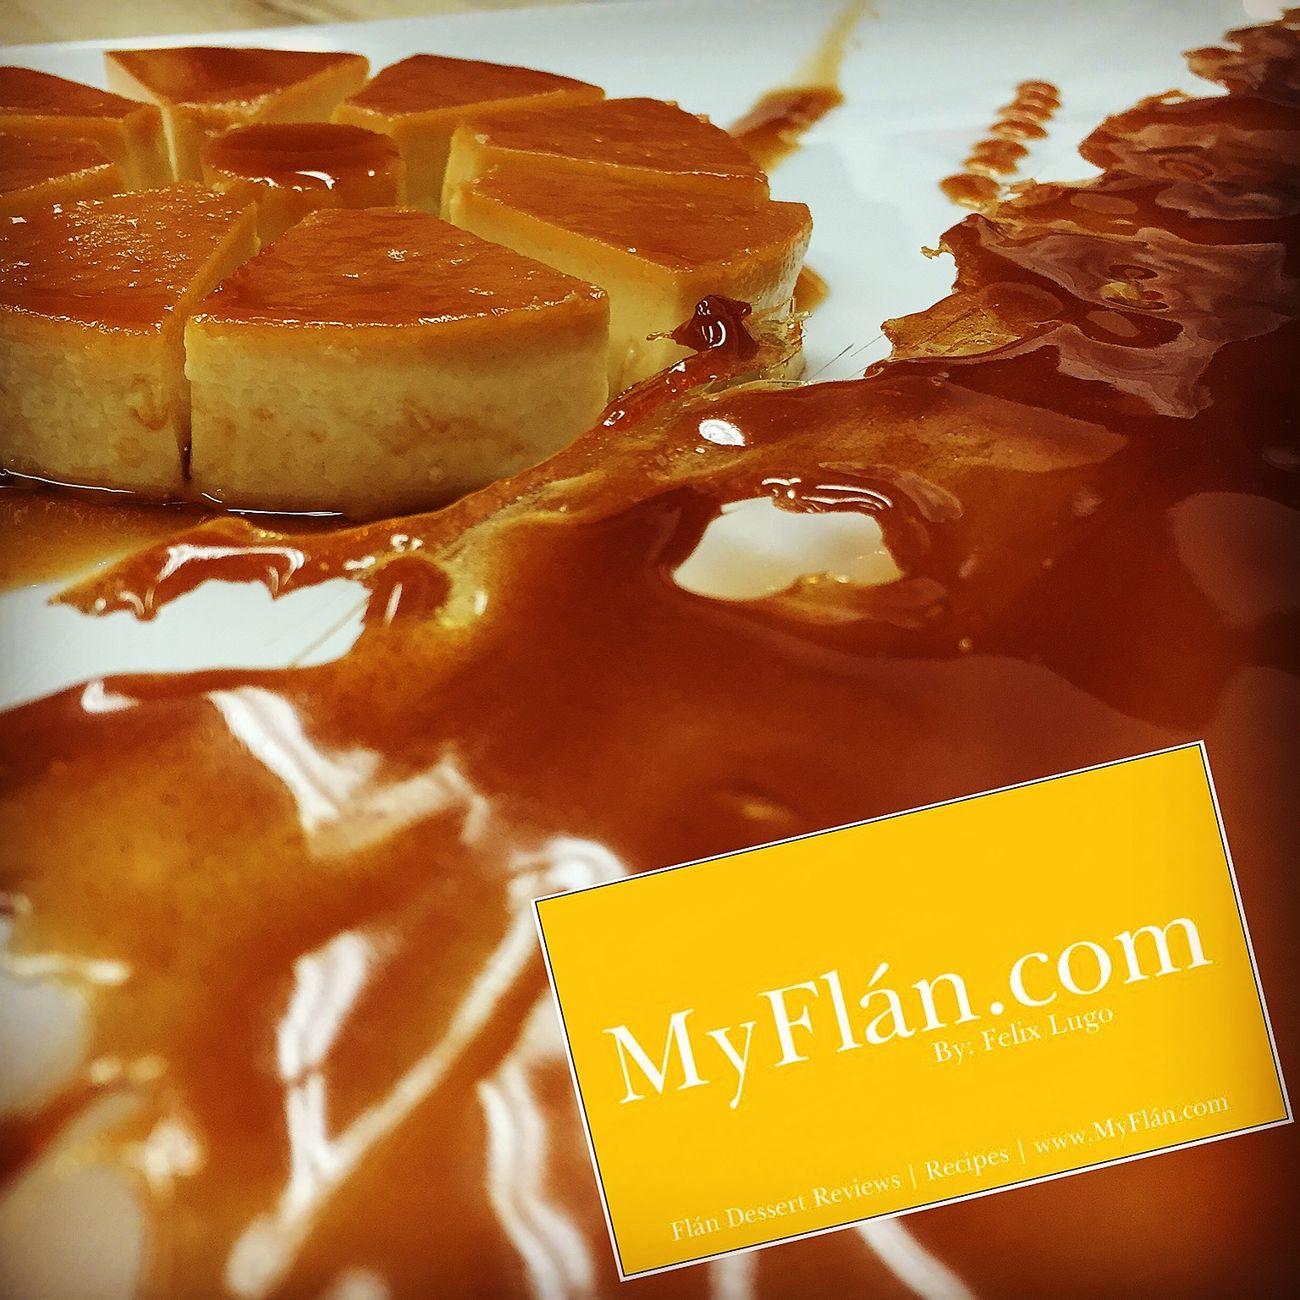 Foodie Flan Cake Pudim Pastry Foodporn Bakery Dessert Myflan Desserts